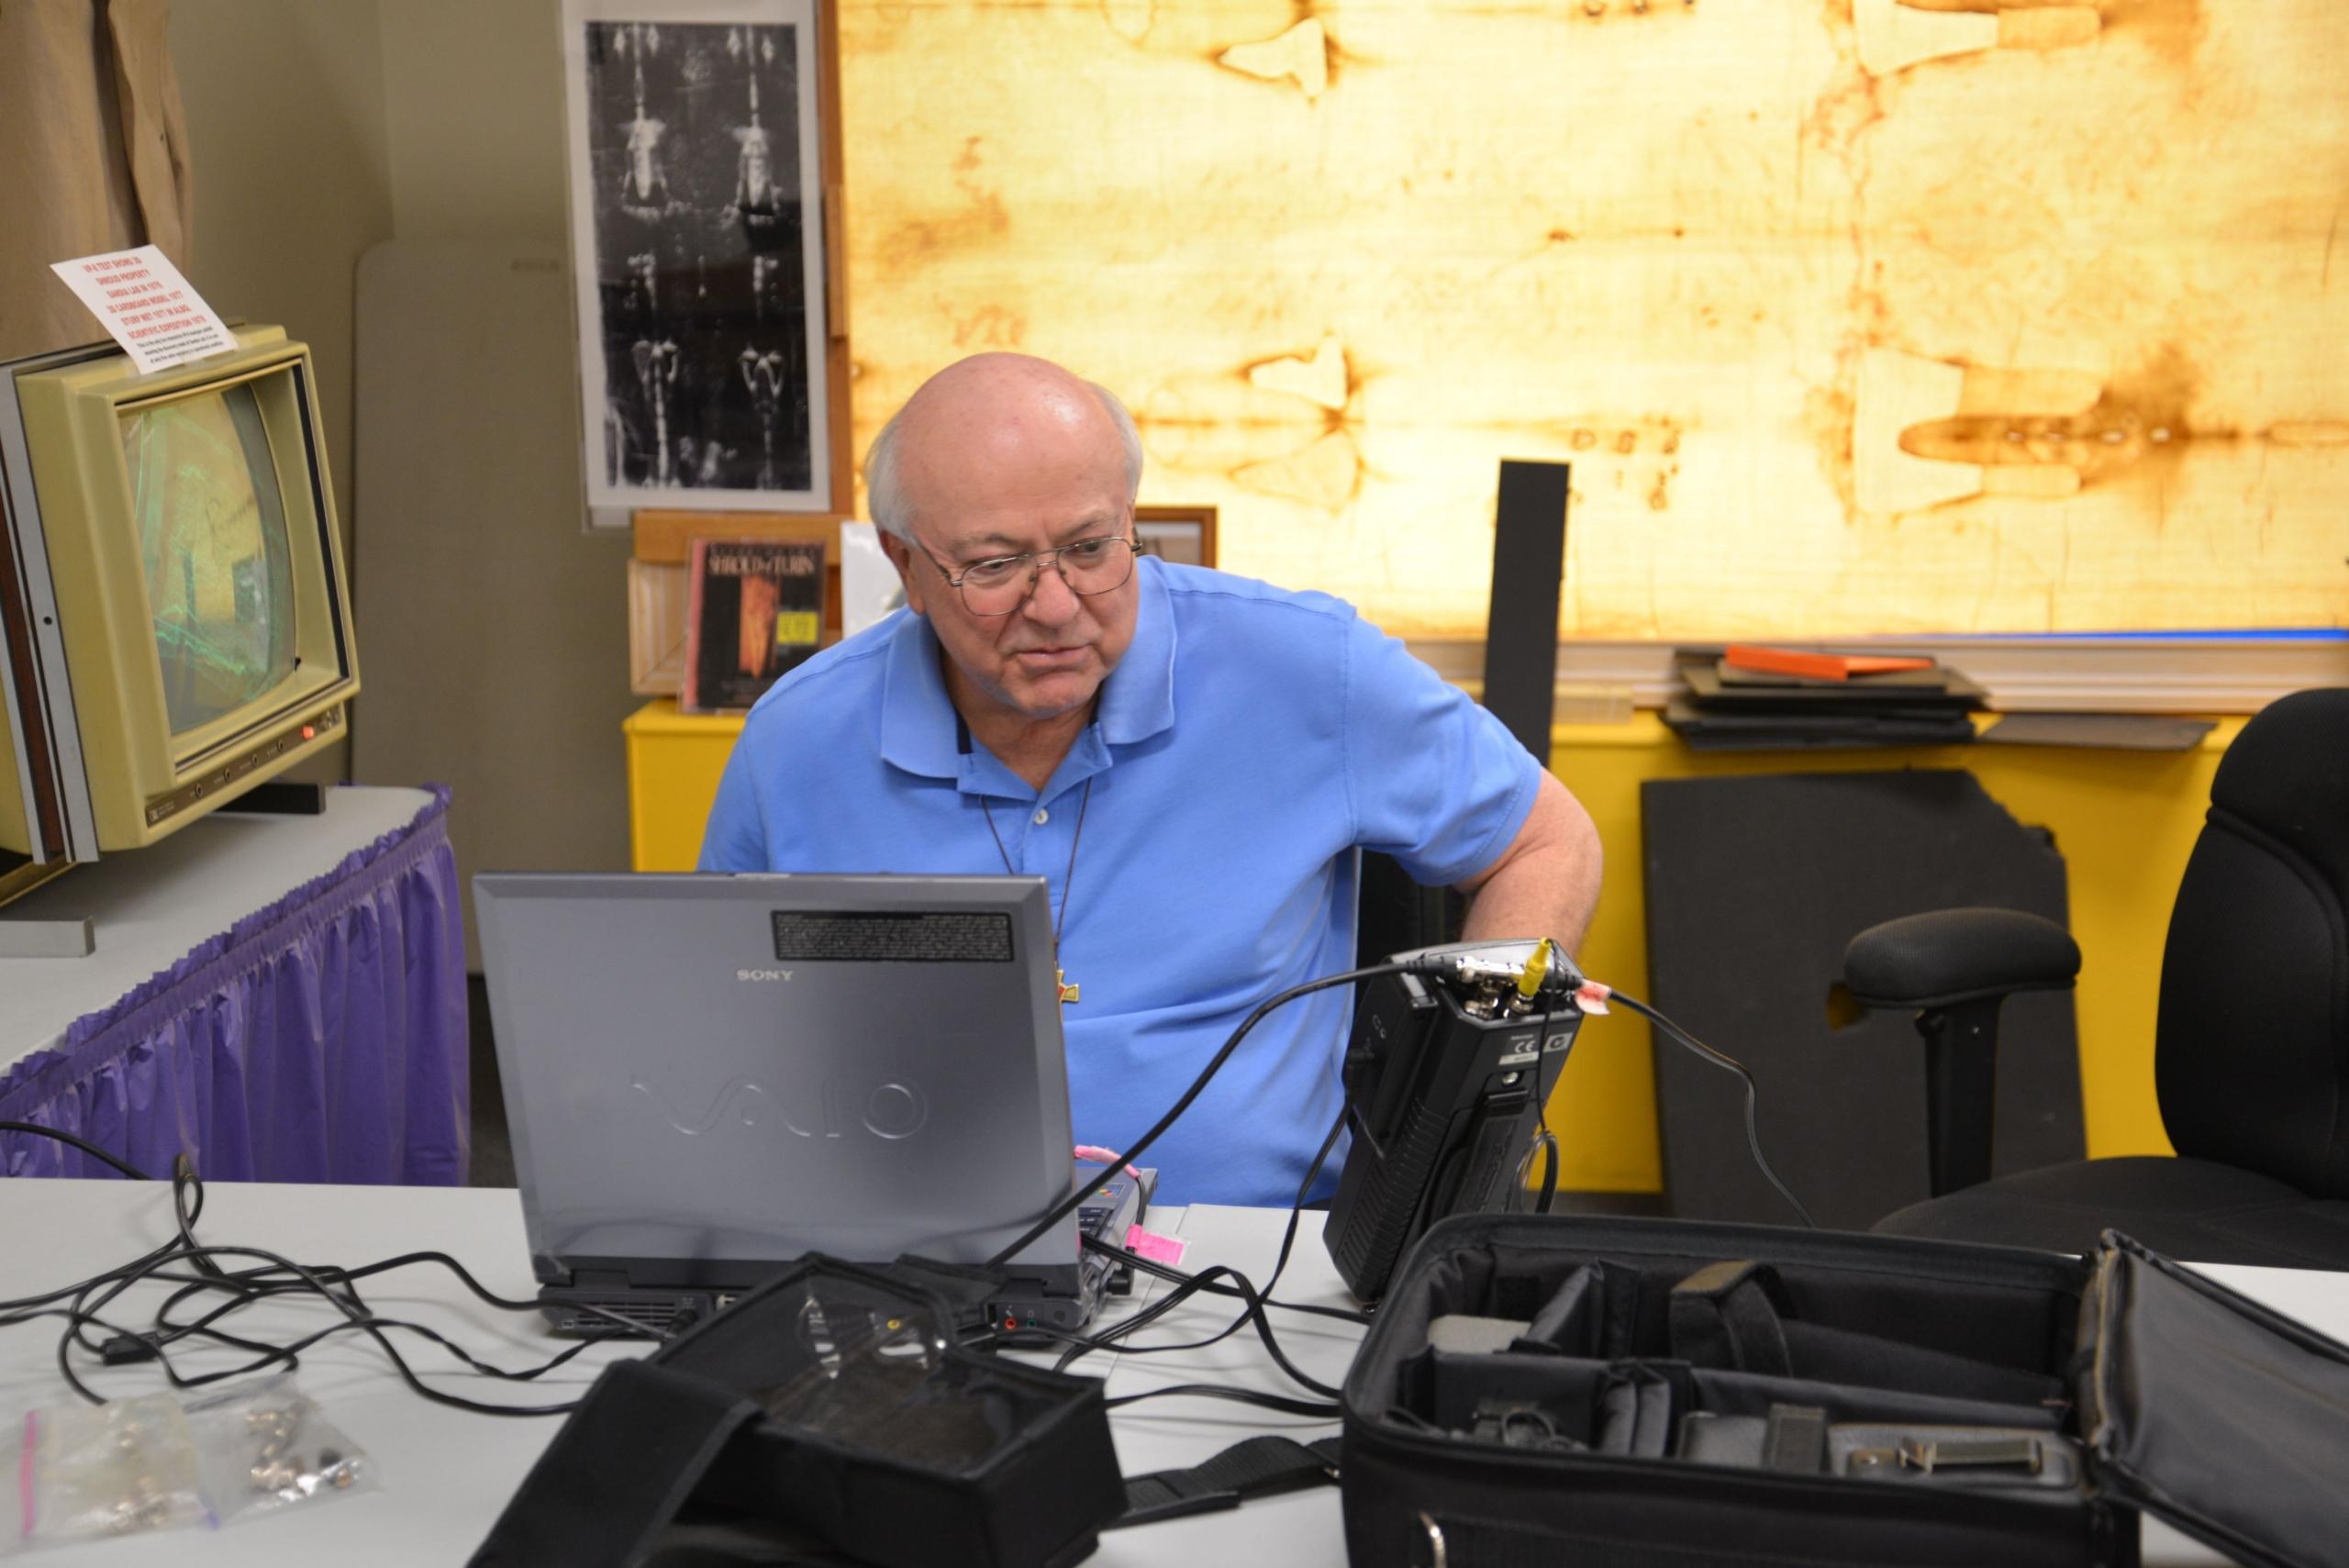 Photo A. Schumacher during research